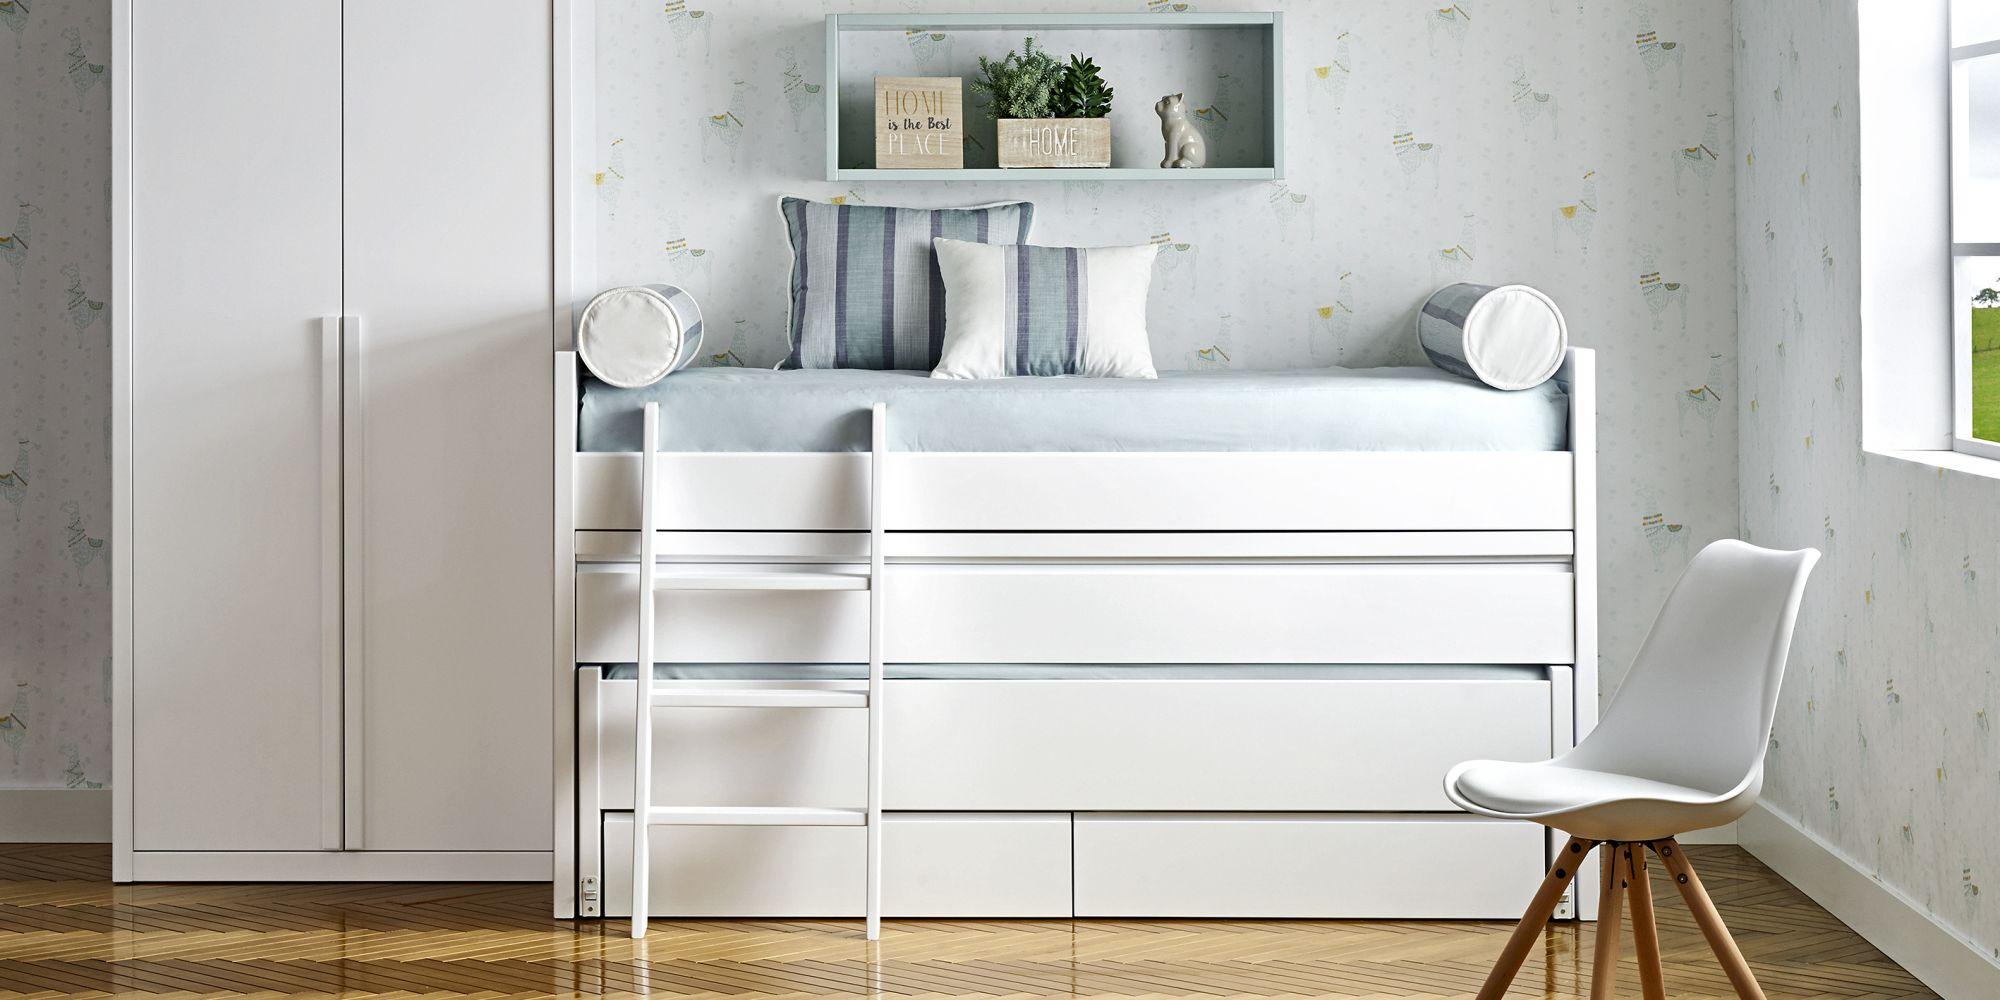 Cama compacta con escritorio incorporado